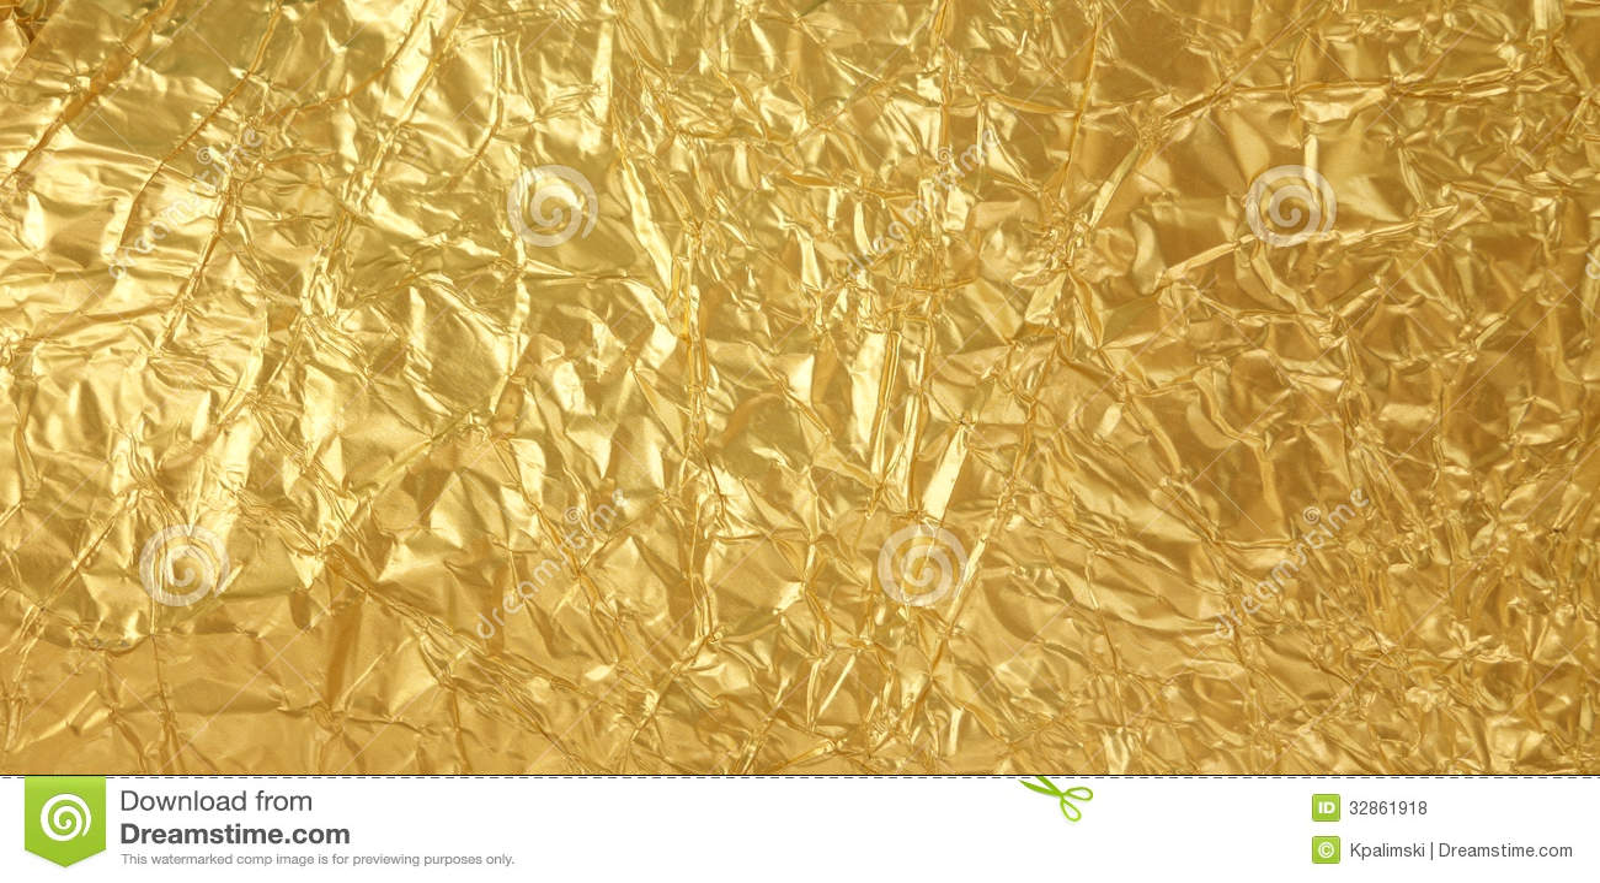 Wallpaper Hd For Living Room Textura Dourada Da Folha Foto De Stock Imagem De Papel